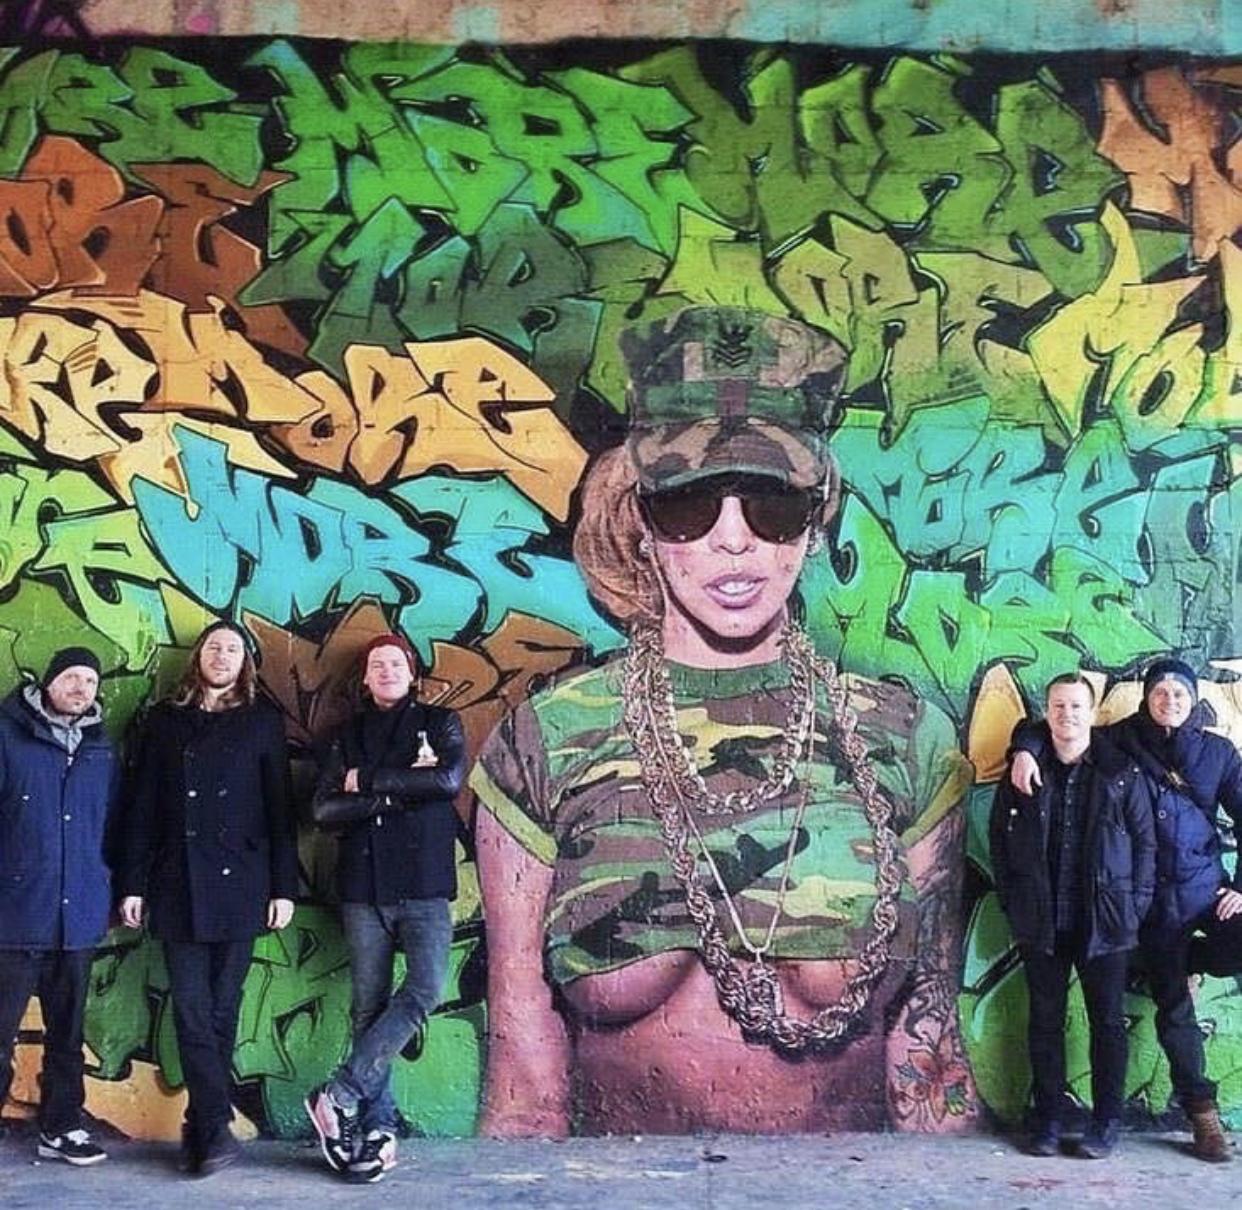 with Nick Flatt & Paul Punk (Berlin, Germany)